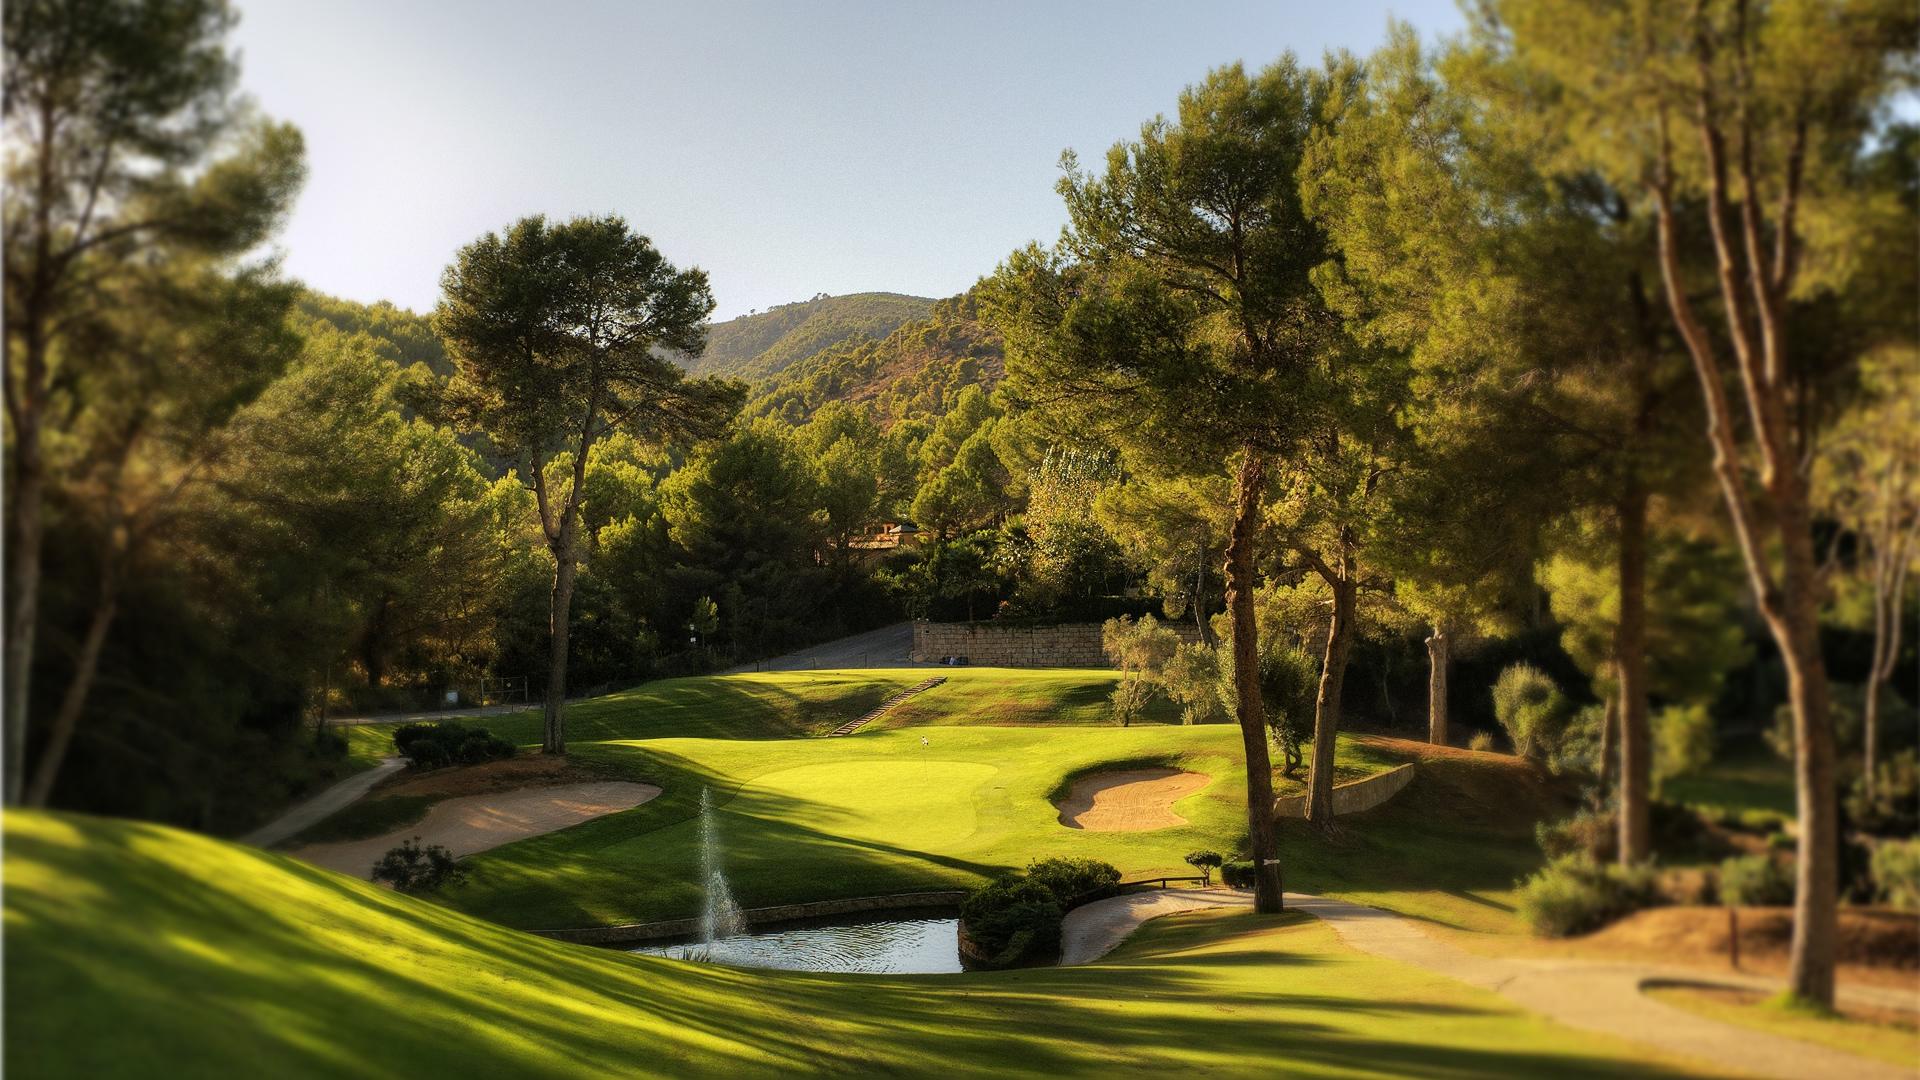 https://www.costalessgolf.com/wp-content/uploads/2015/05/Son-Vida-Golf.jpg